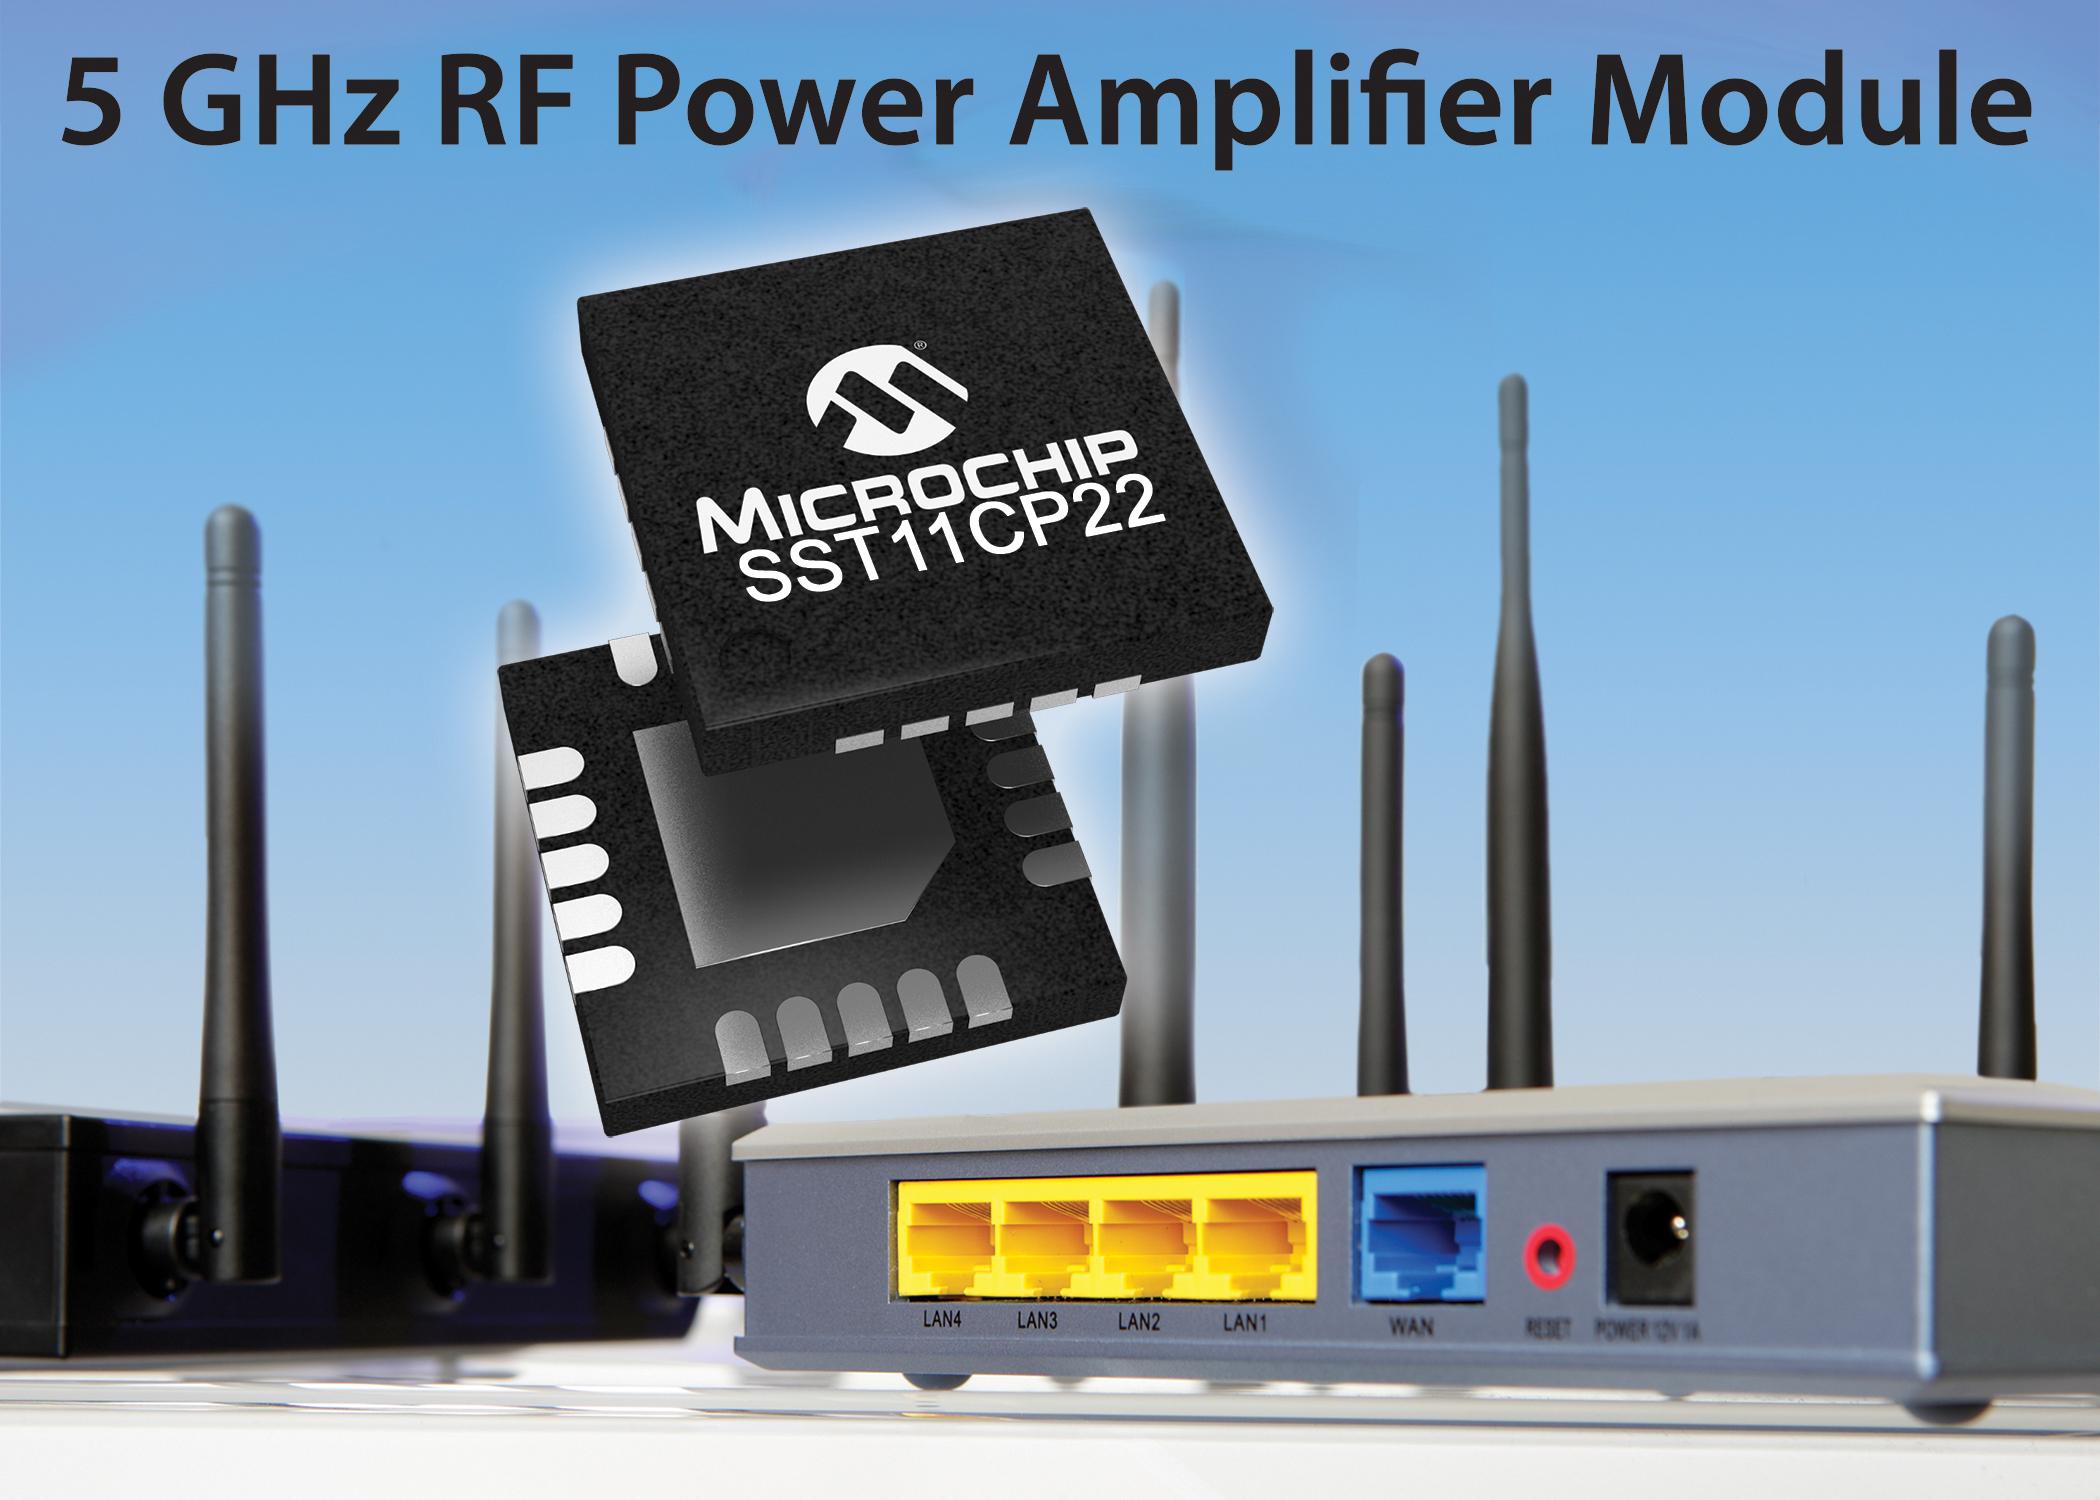 Microchip推出基于IEEE 802.11ac Wi-Fi标准的功率放大器模块